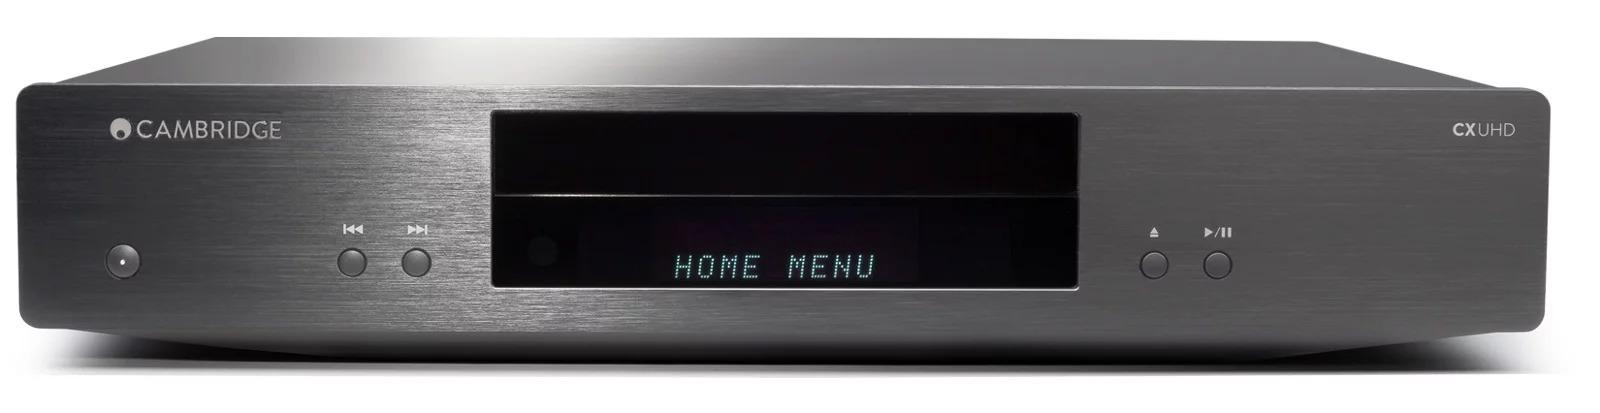 4K-плеер Cambrige Audio CXUHD - передняя панель